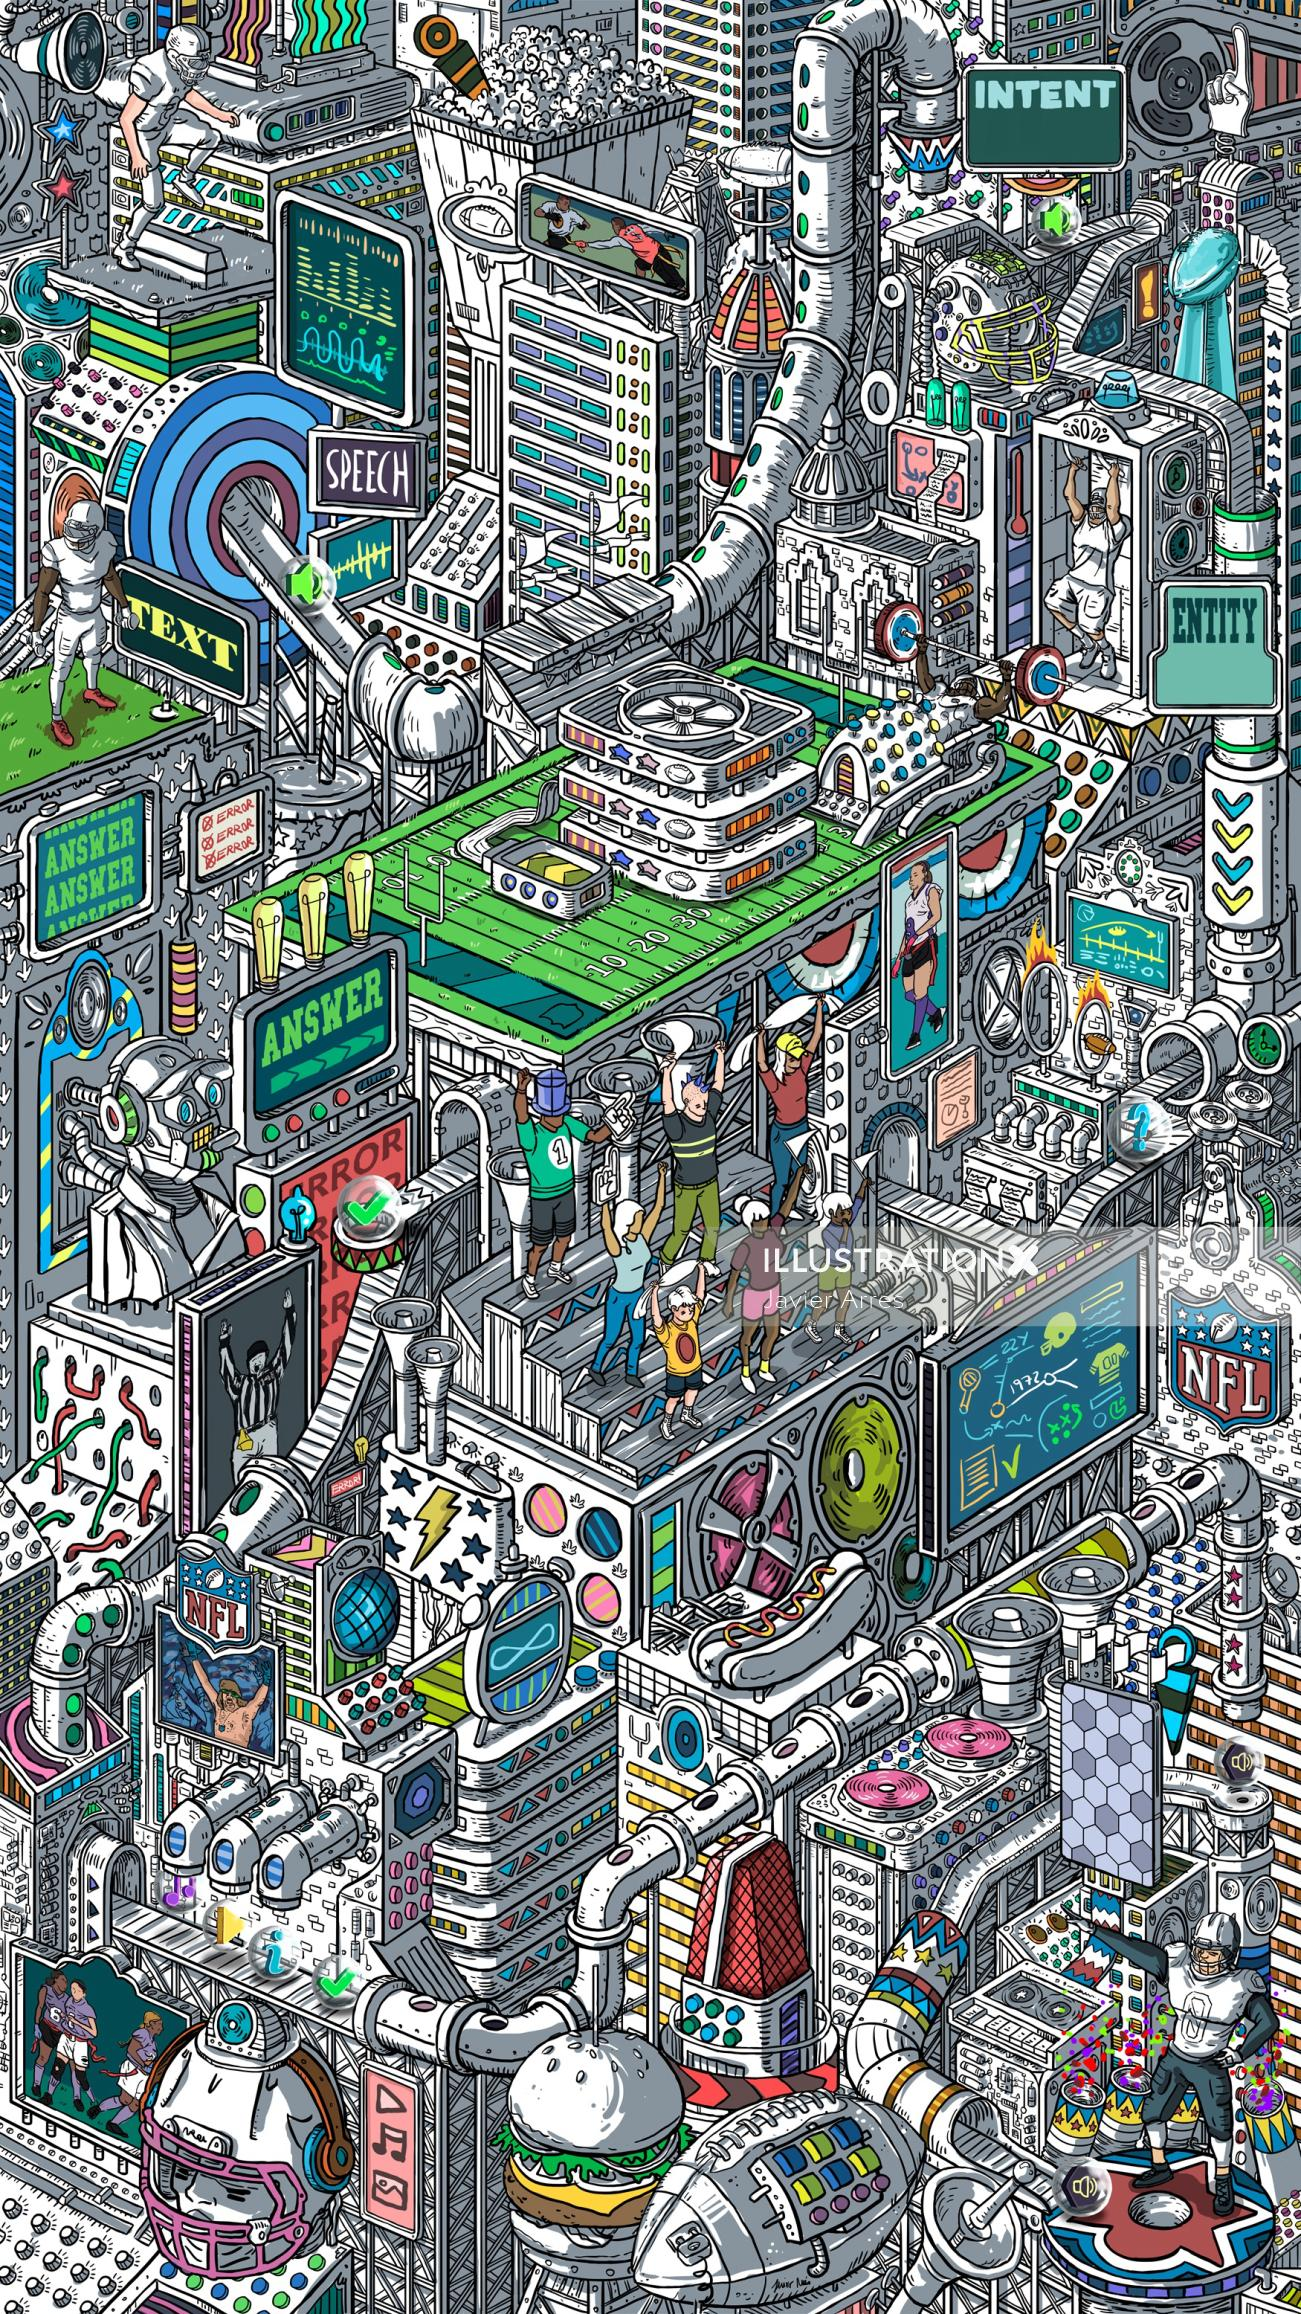 Architecture illustration of City